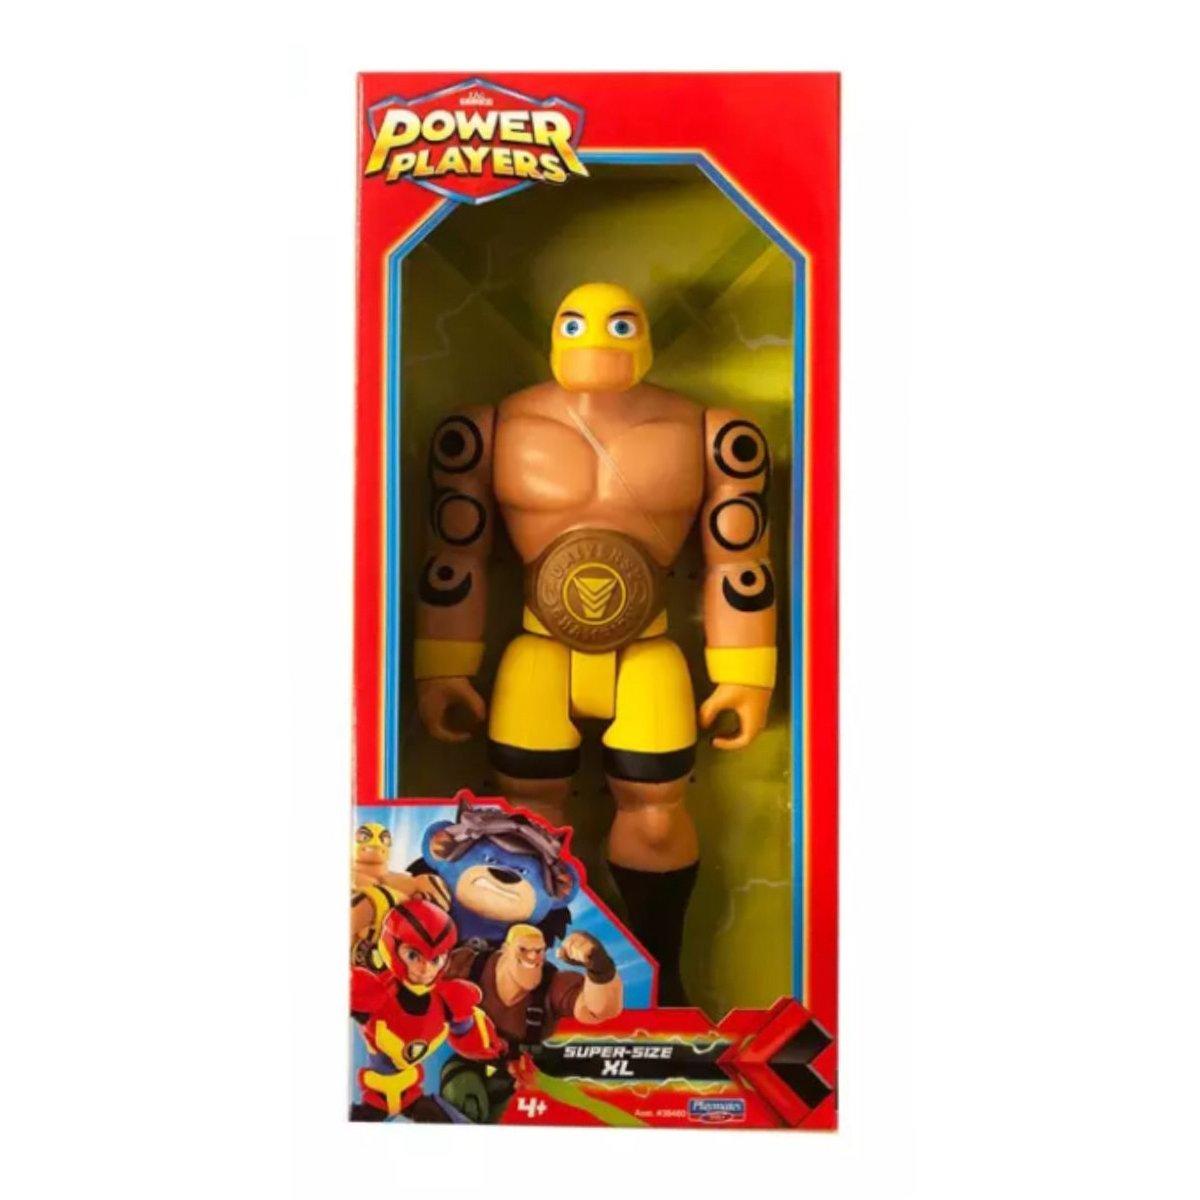 Figurina articulata Power Players, Masko, XL